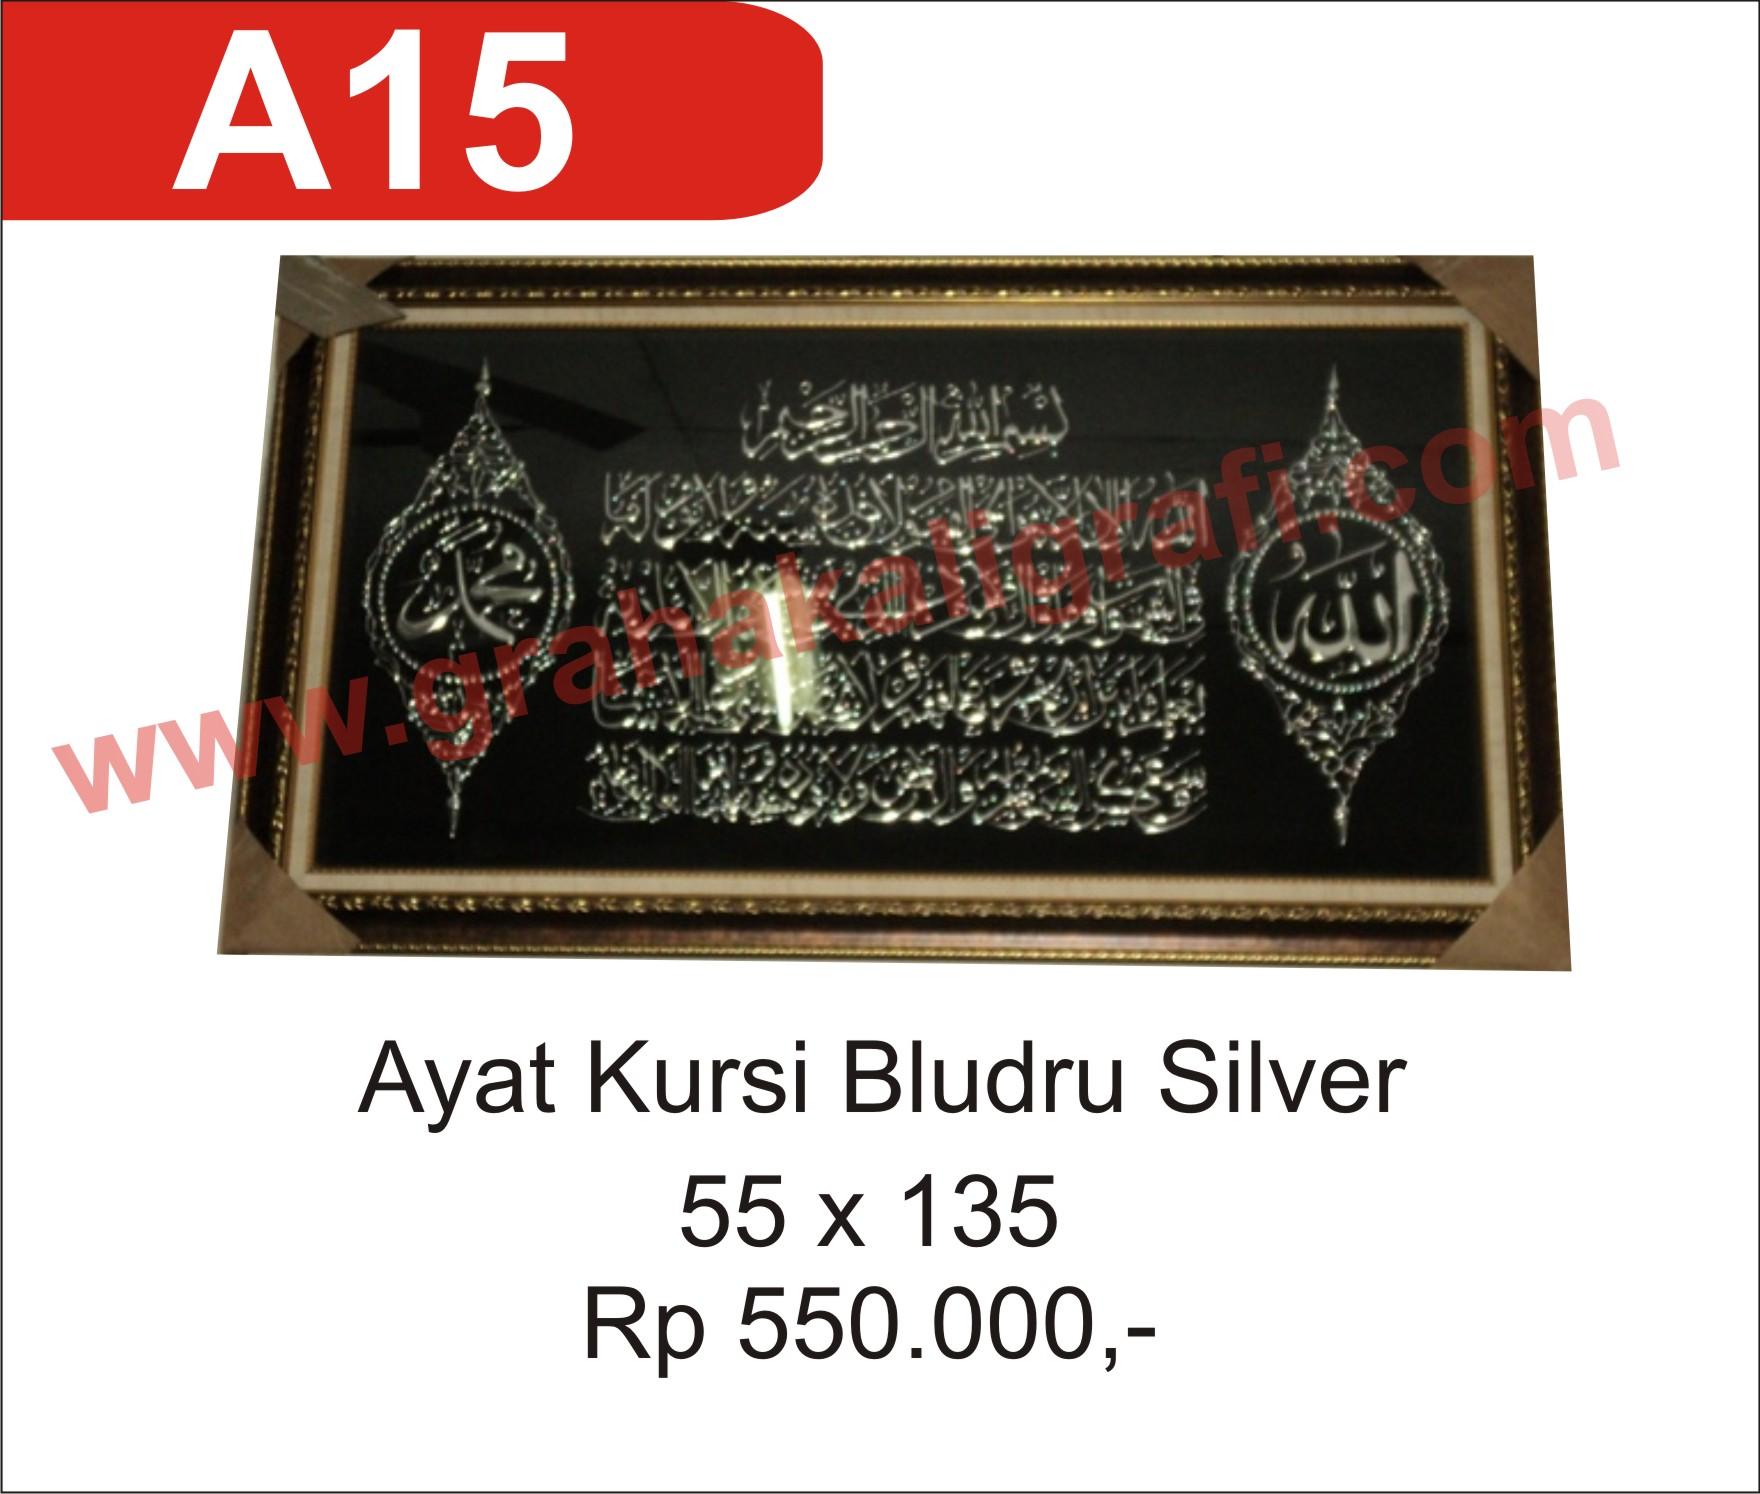 A15 Ayat Kursi Bludru Silver Graha Kaligrafi E28093 Kaligra